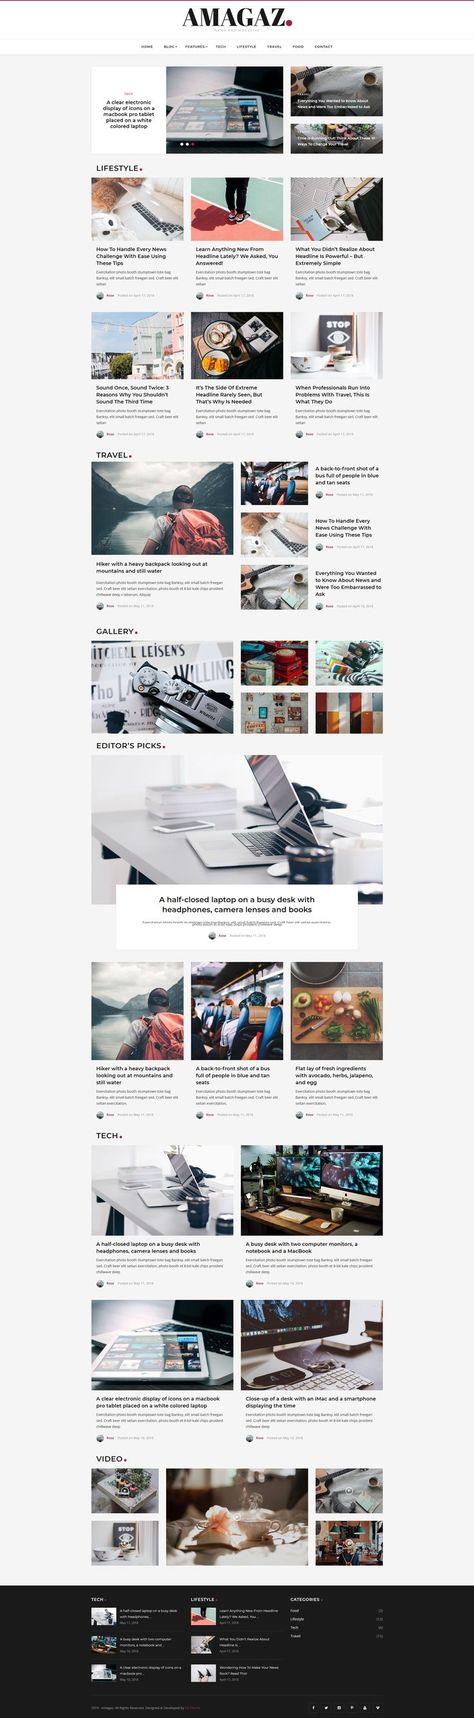 Amagaz - News and Magazine WordPress Theme - AZ-Theme.Net